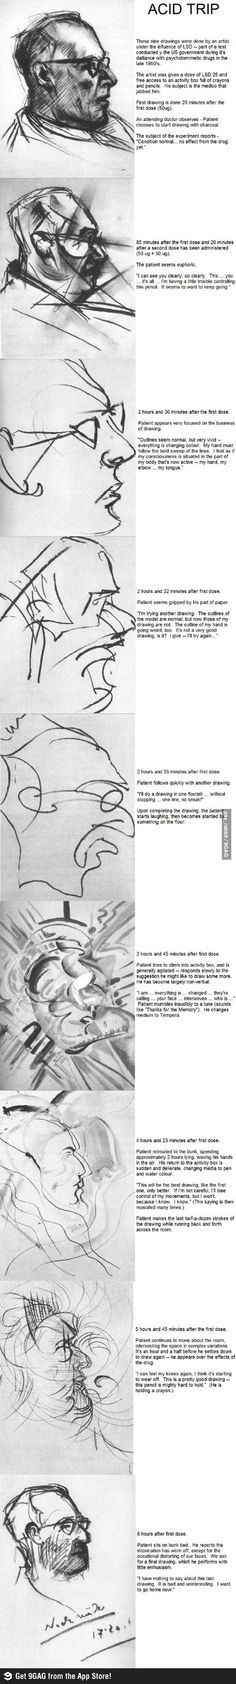 Drawing on acid